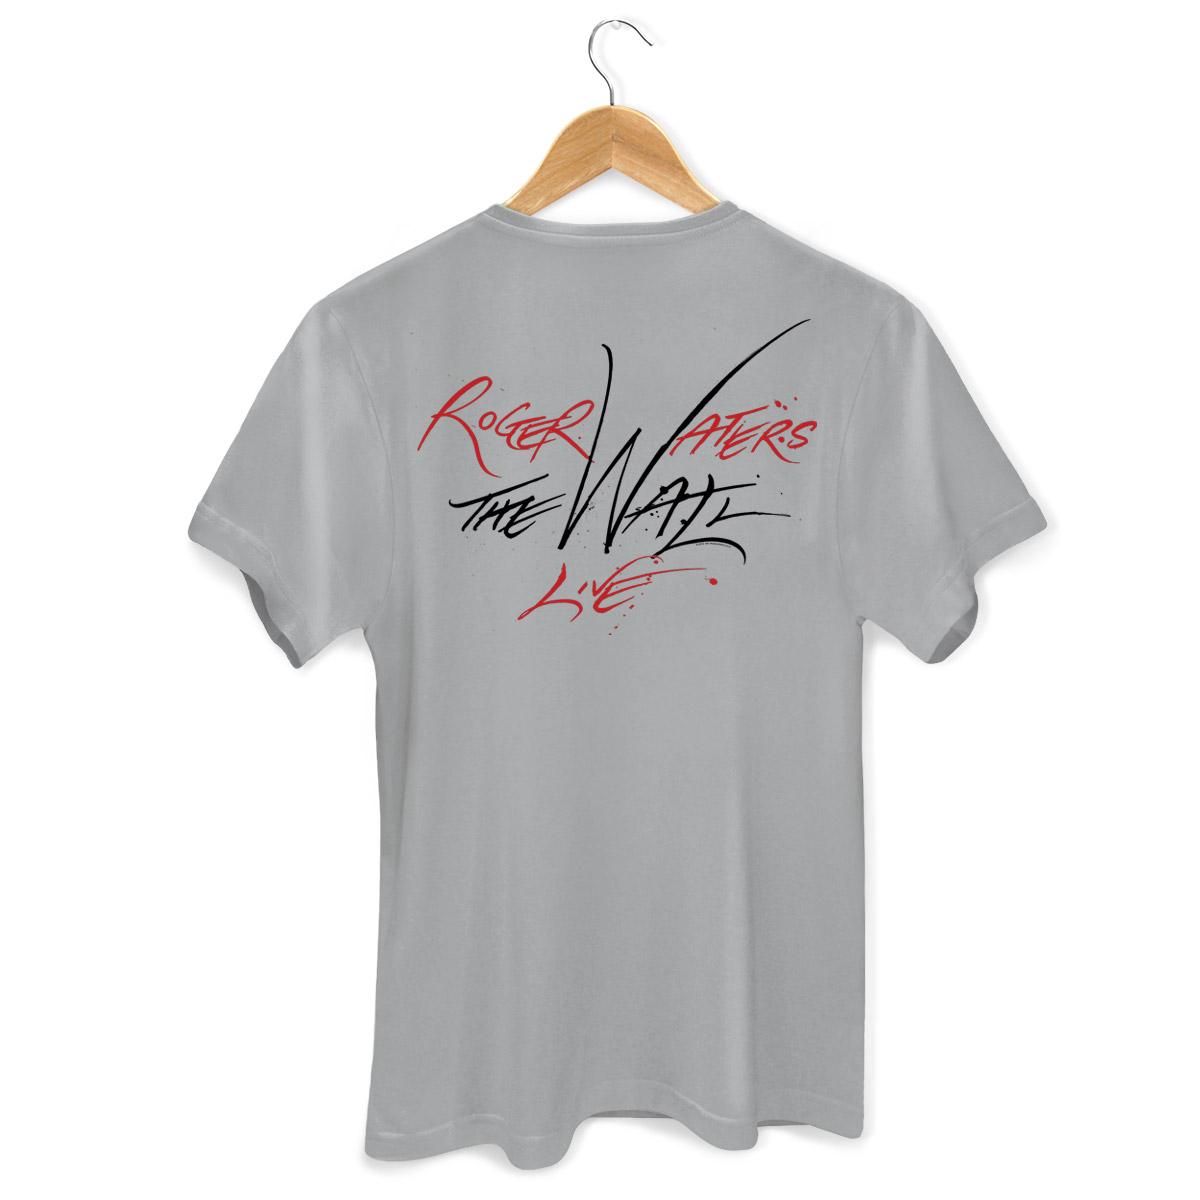 Camiseta Masculina Roger Waters Bombas